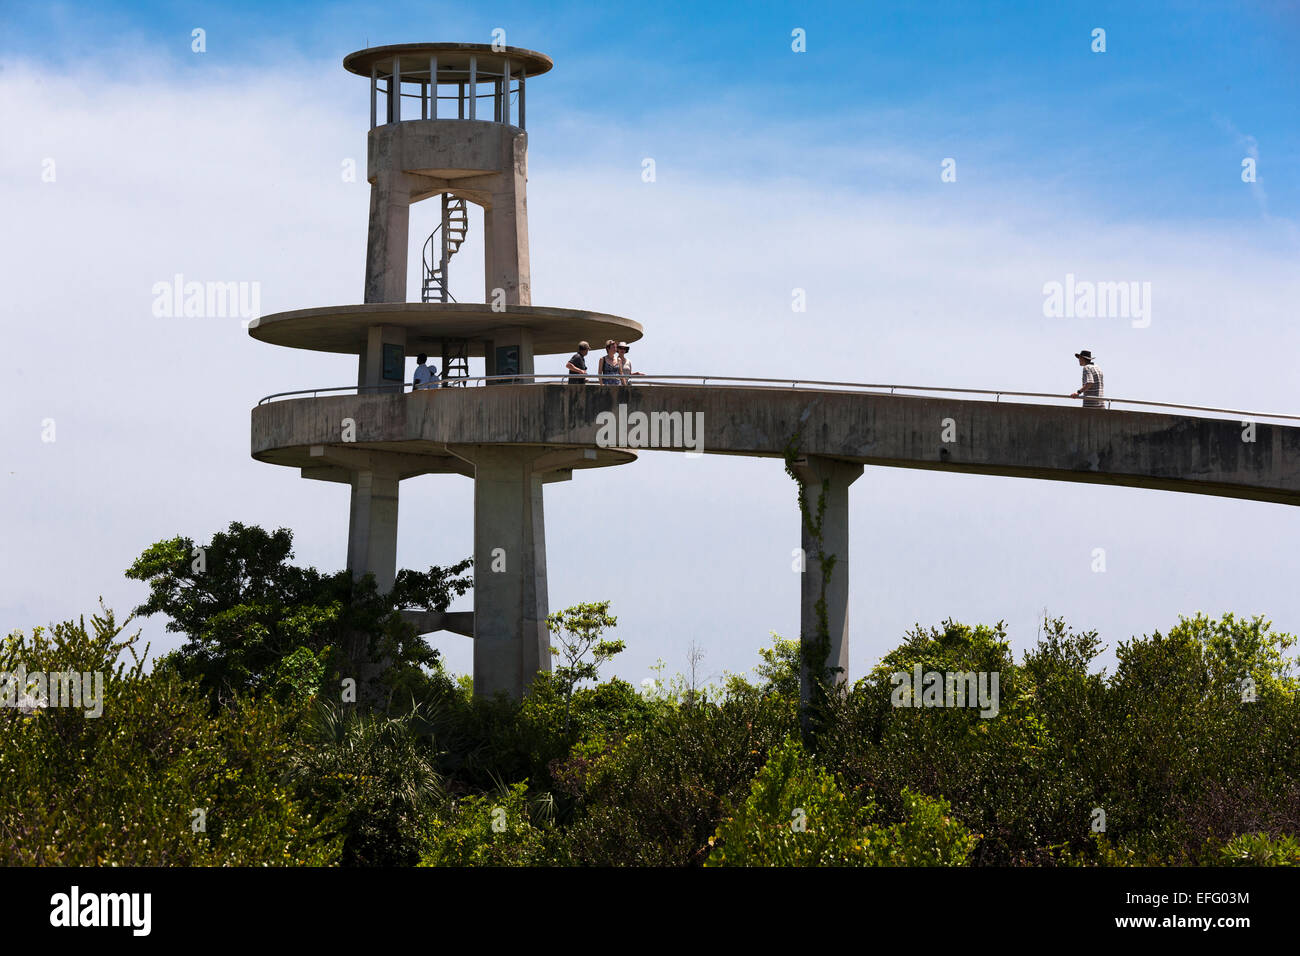 Shark Valley Everglades Visitors Observation Tower Everglades National Park Florida US - Stock Image